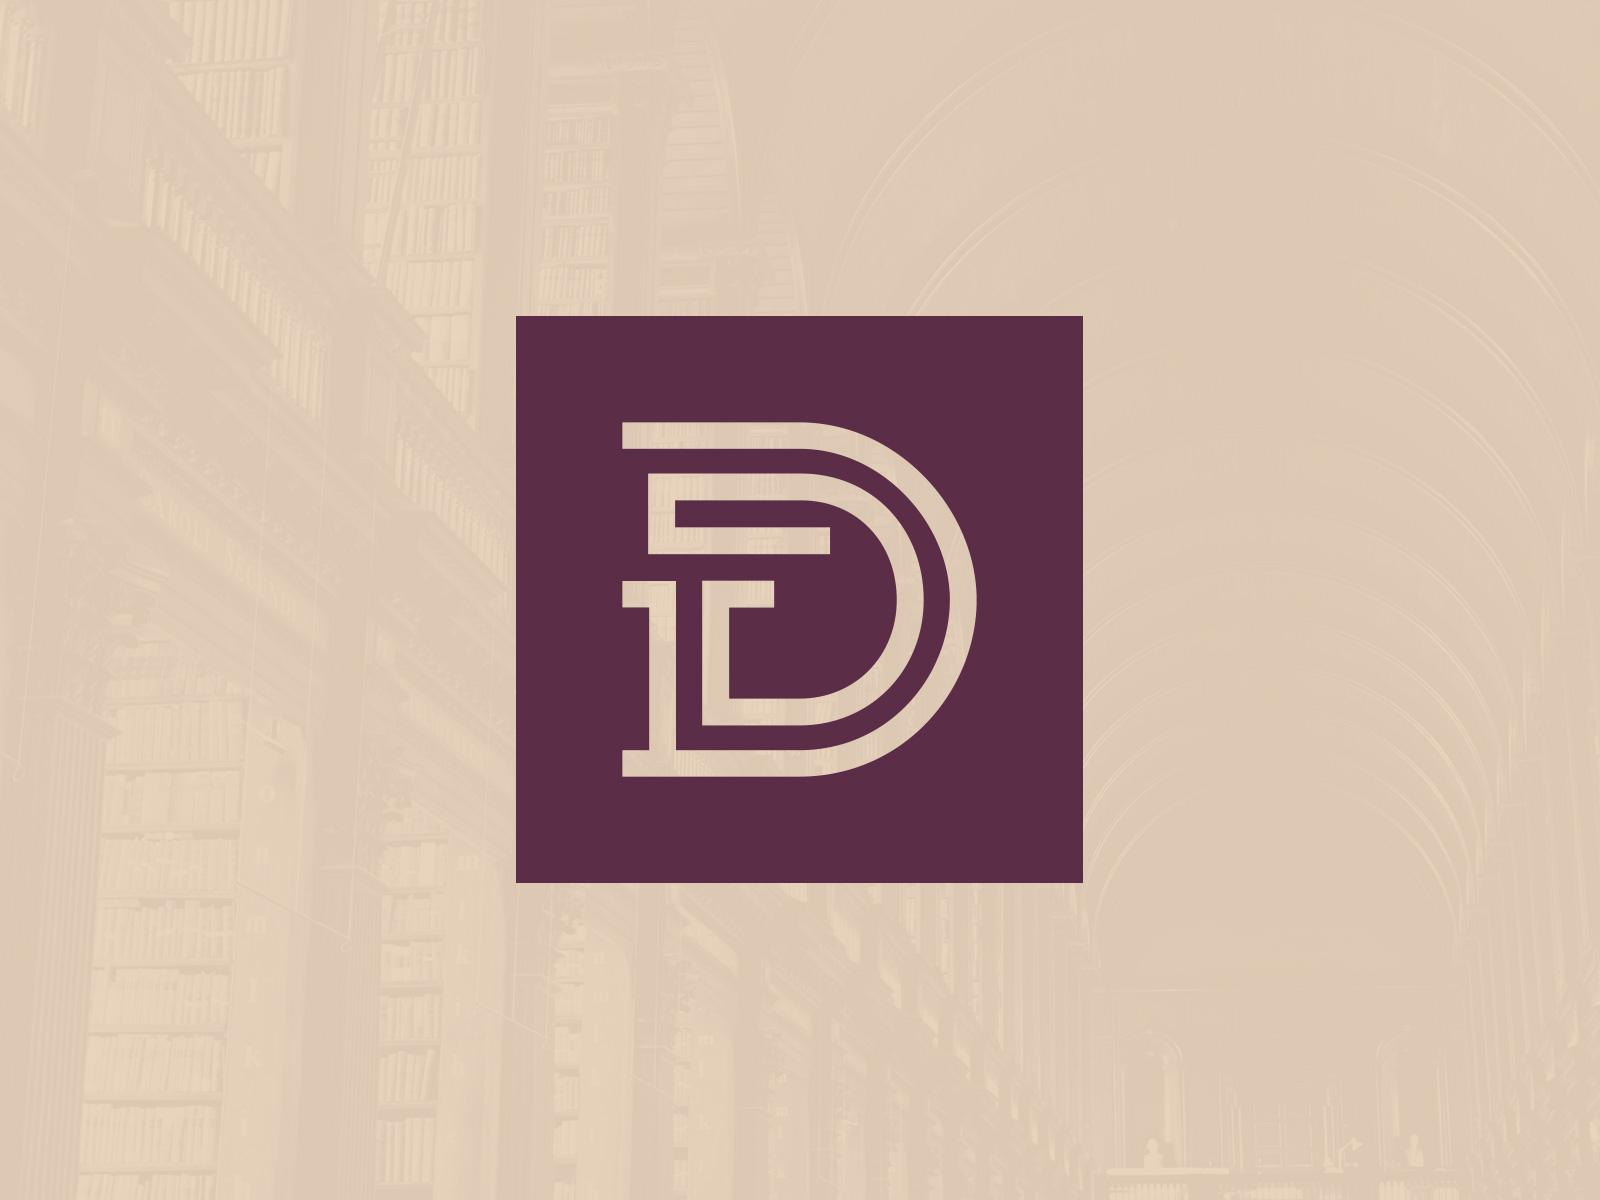 2019 01 15 dickson d